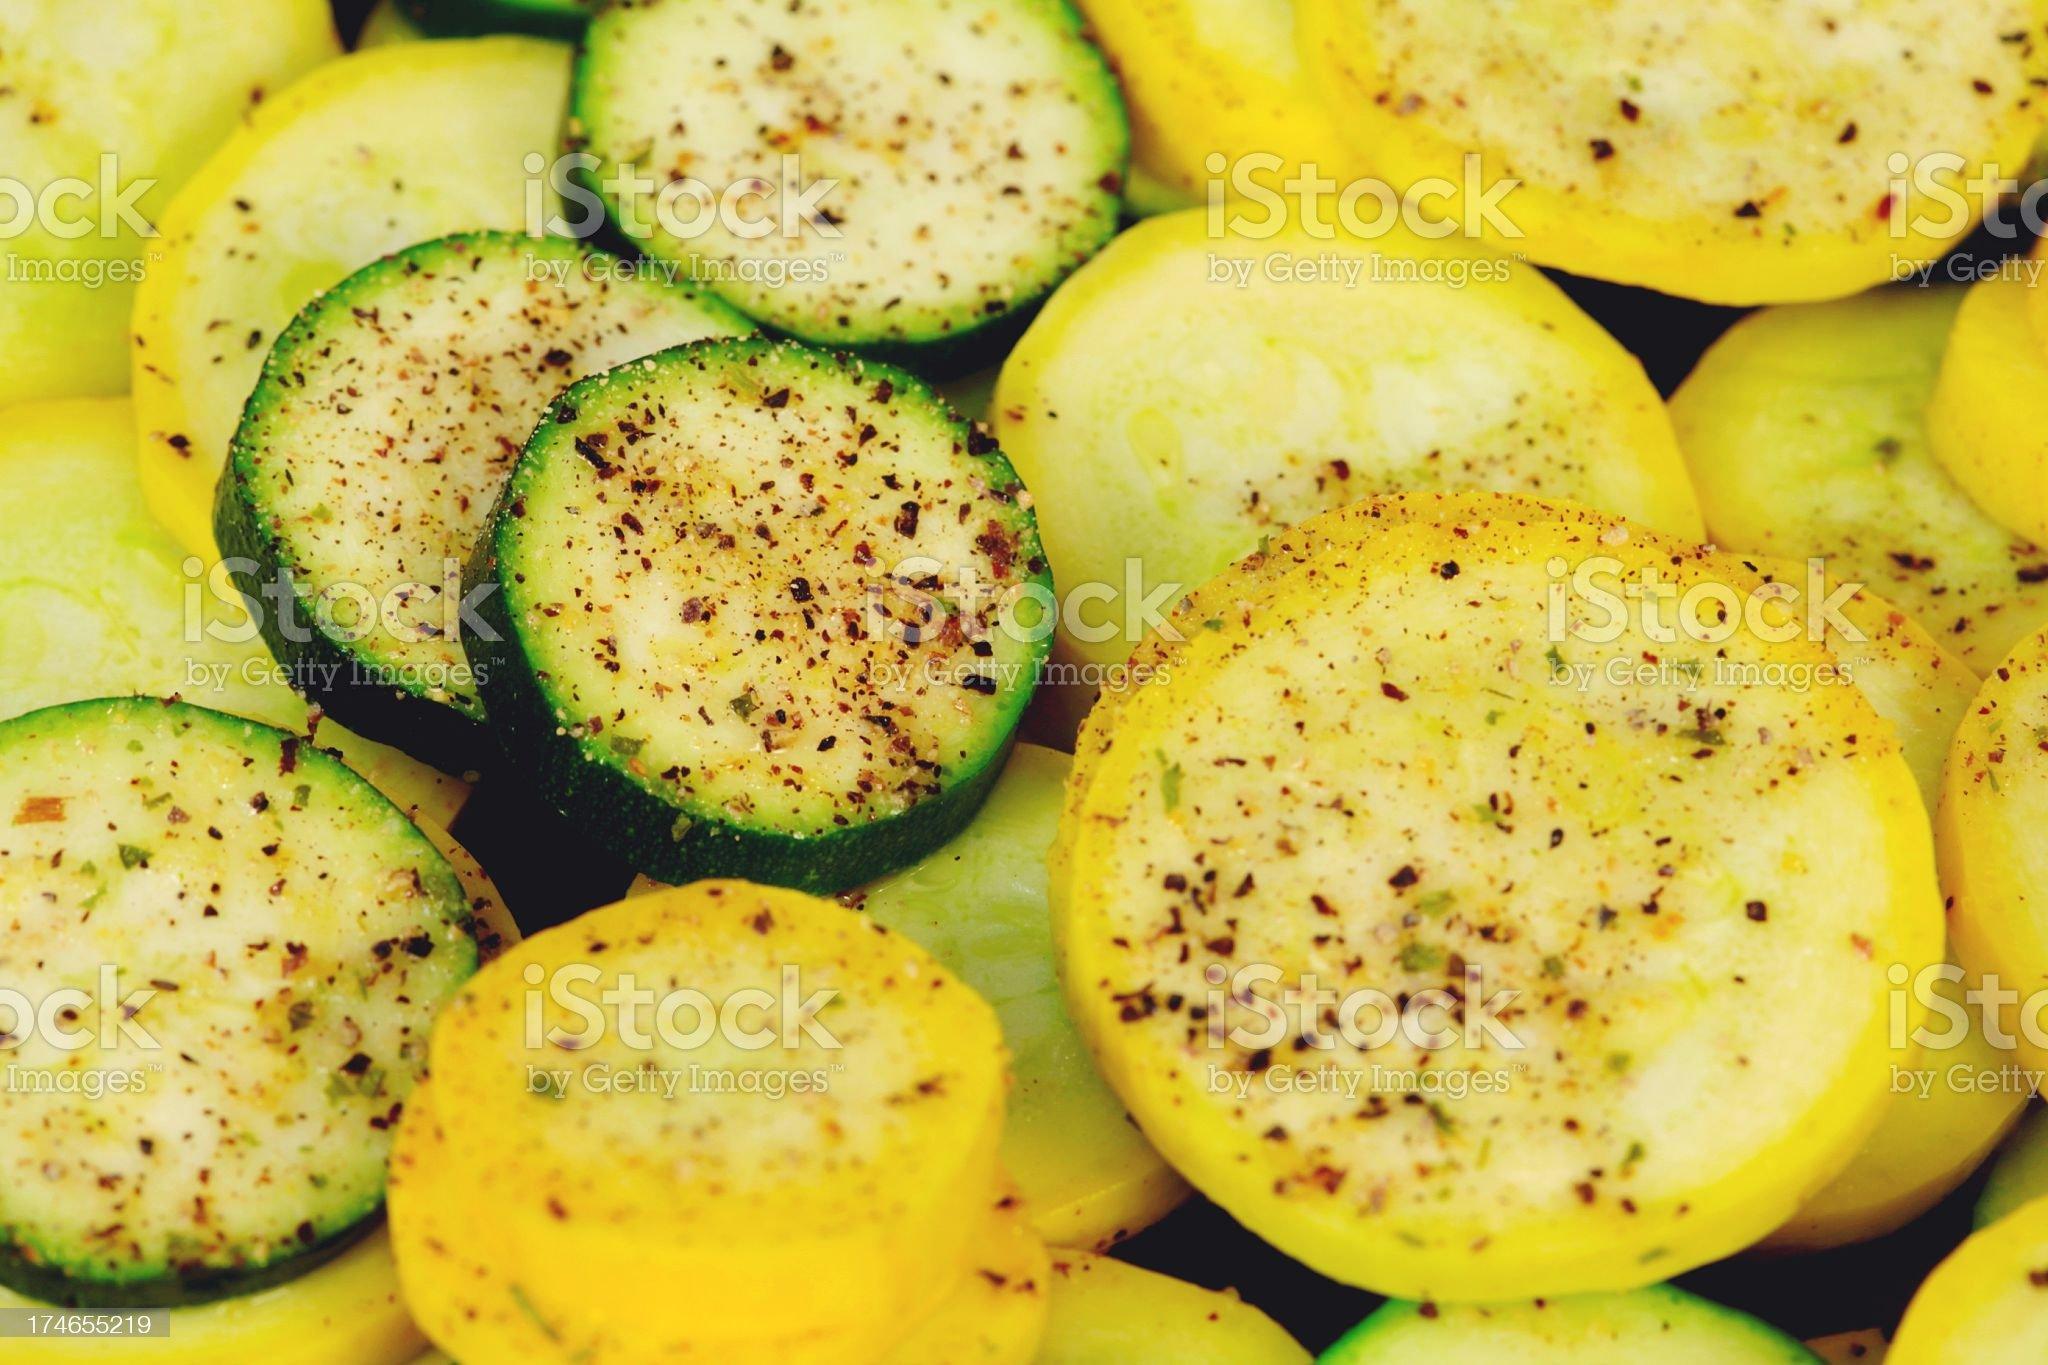 Seasoned yellow Squash and green zucchini royalty-free stock photo